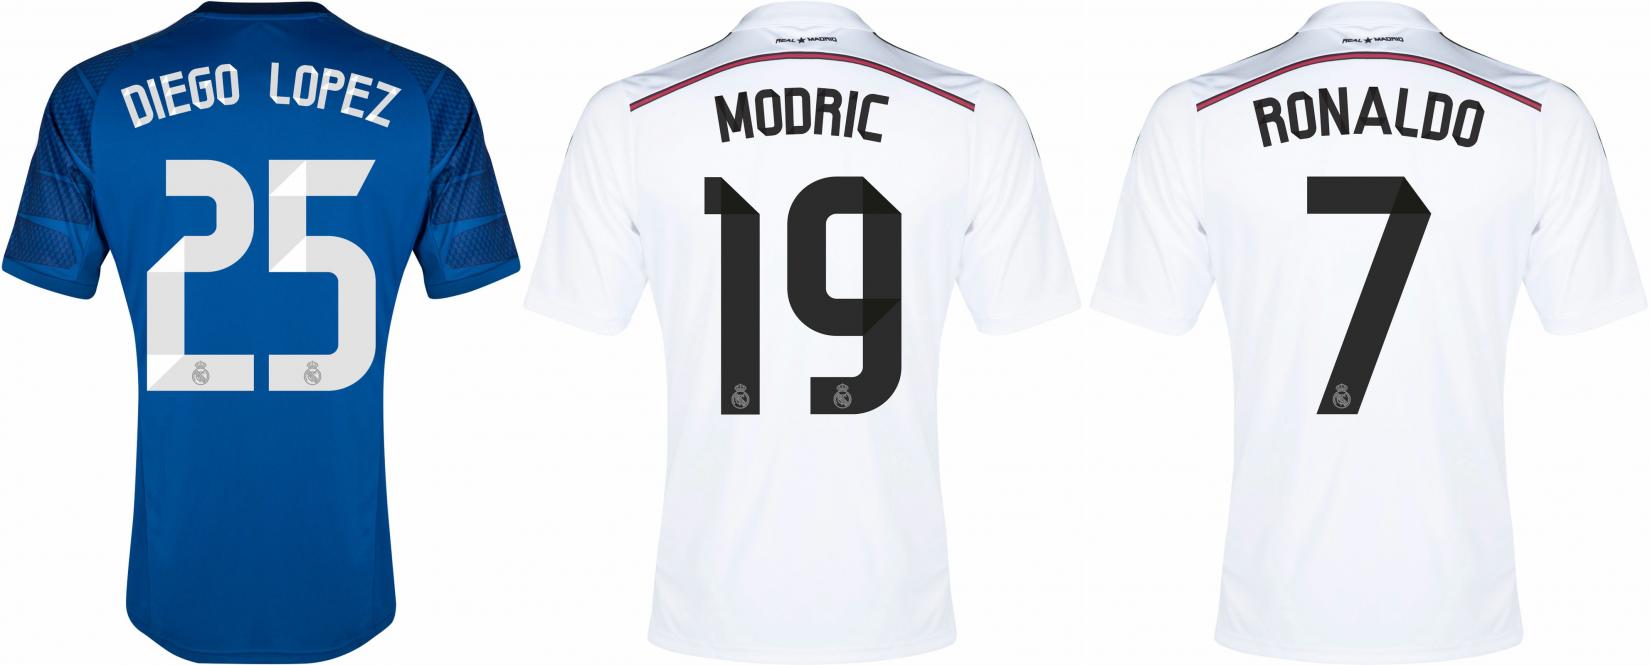 online store 5a595 6504a Real Madrid kit font - forum | dafont.com